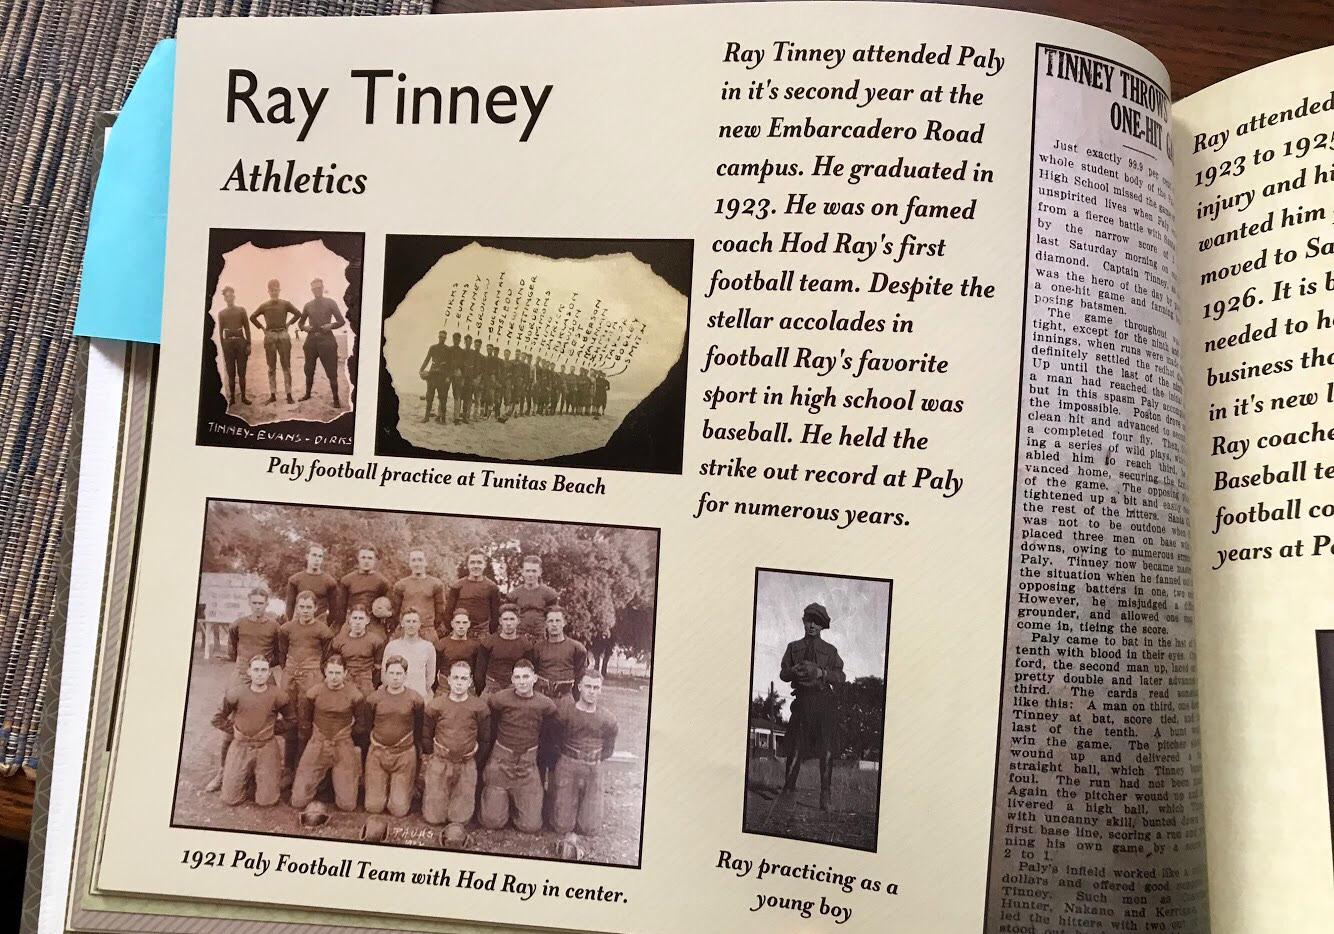 Ray Tinney, who graduated in 1923, was on legendary coach Hod Ray's first championship football team. Photo by Elena Kadvany.